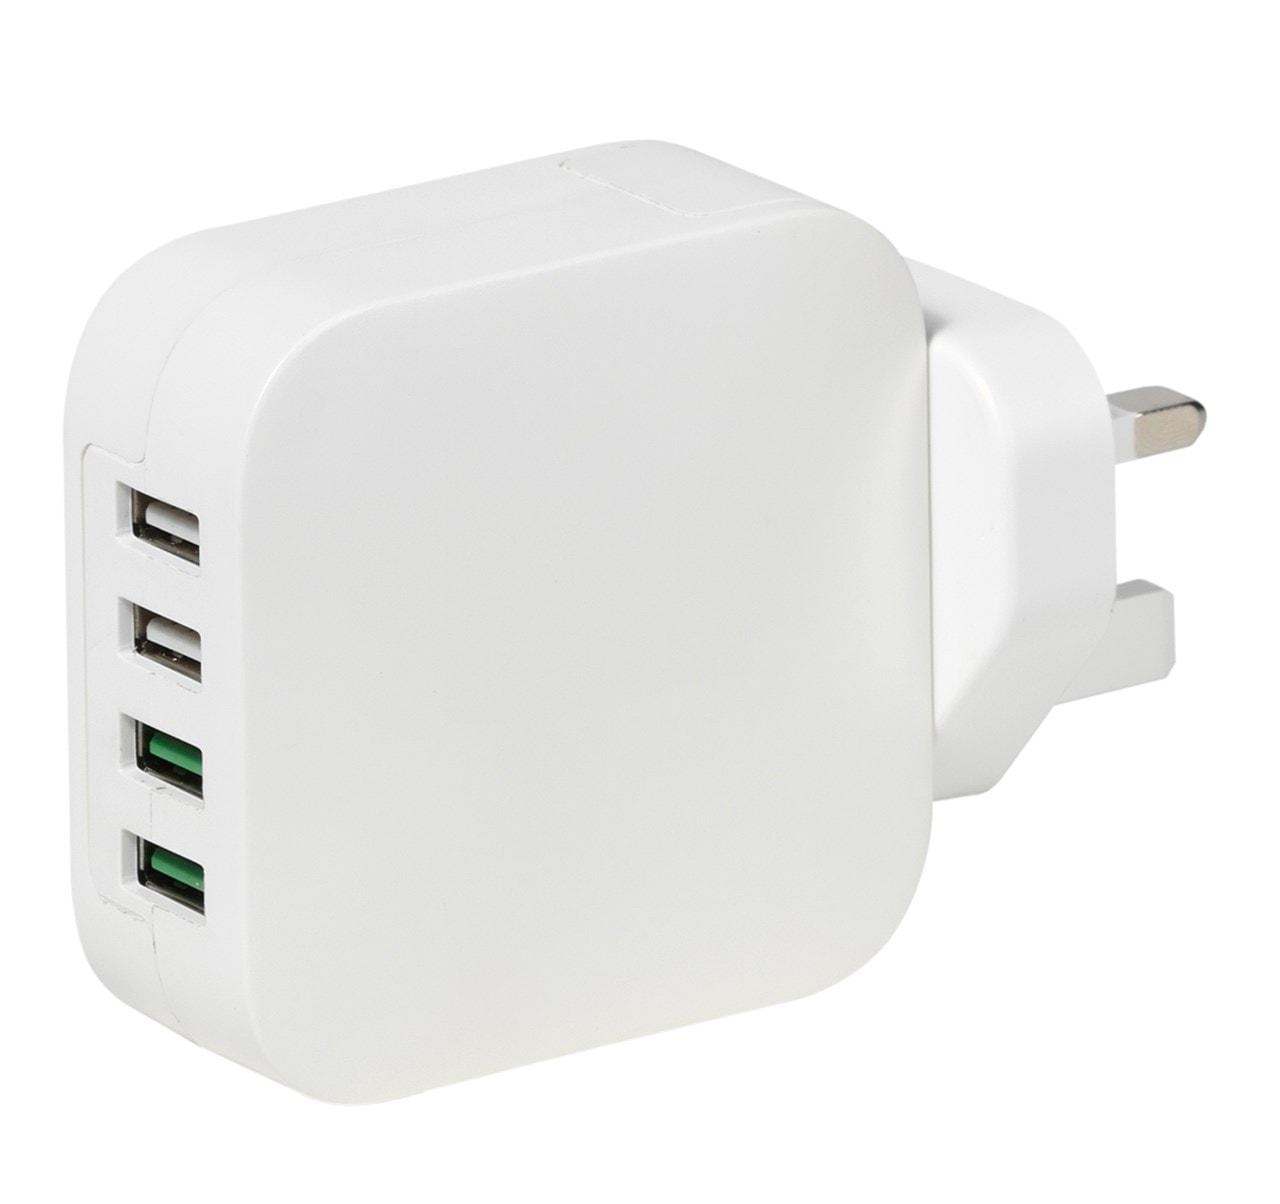 Vivanco USB Multi Port Plug With Quick Charge Port - 1